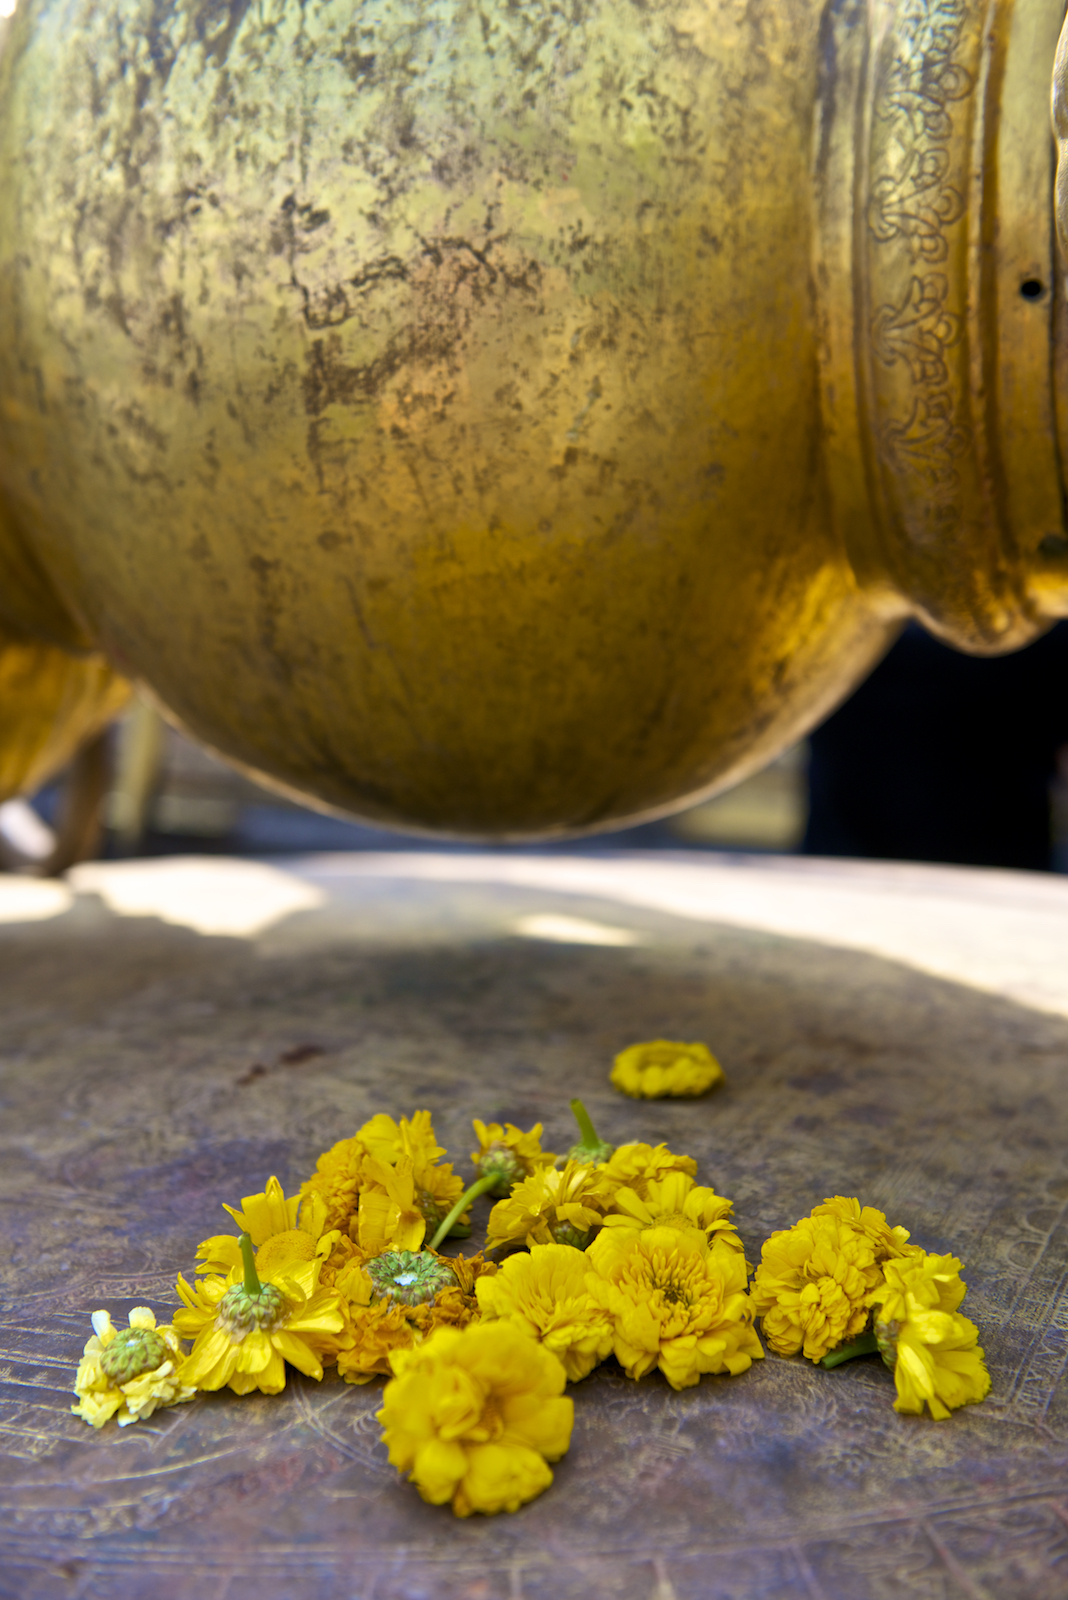 Flowers at Swayambhunath Temple, Kathmandu Nepal.  Image by New Orleans based travel photographer, Marc Pagani - marcpagani.com